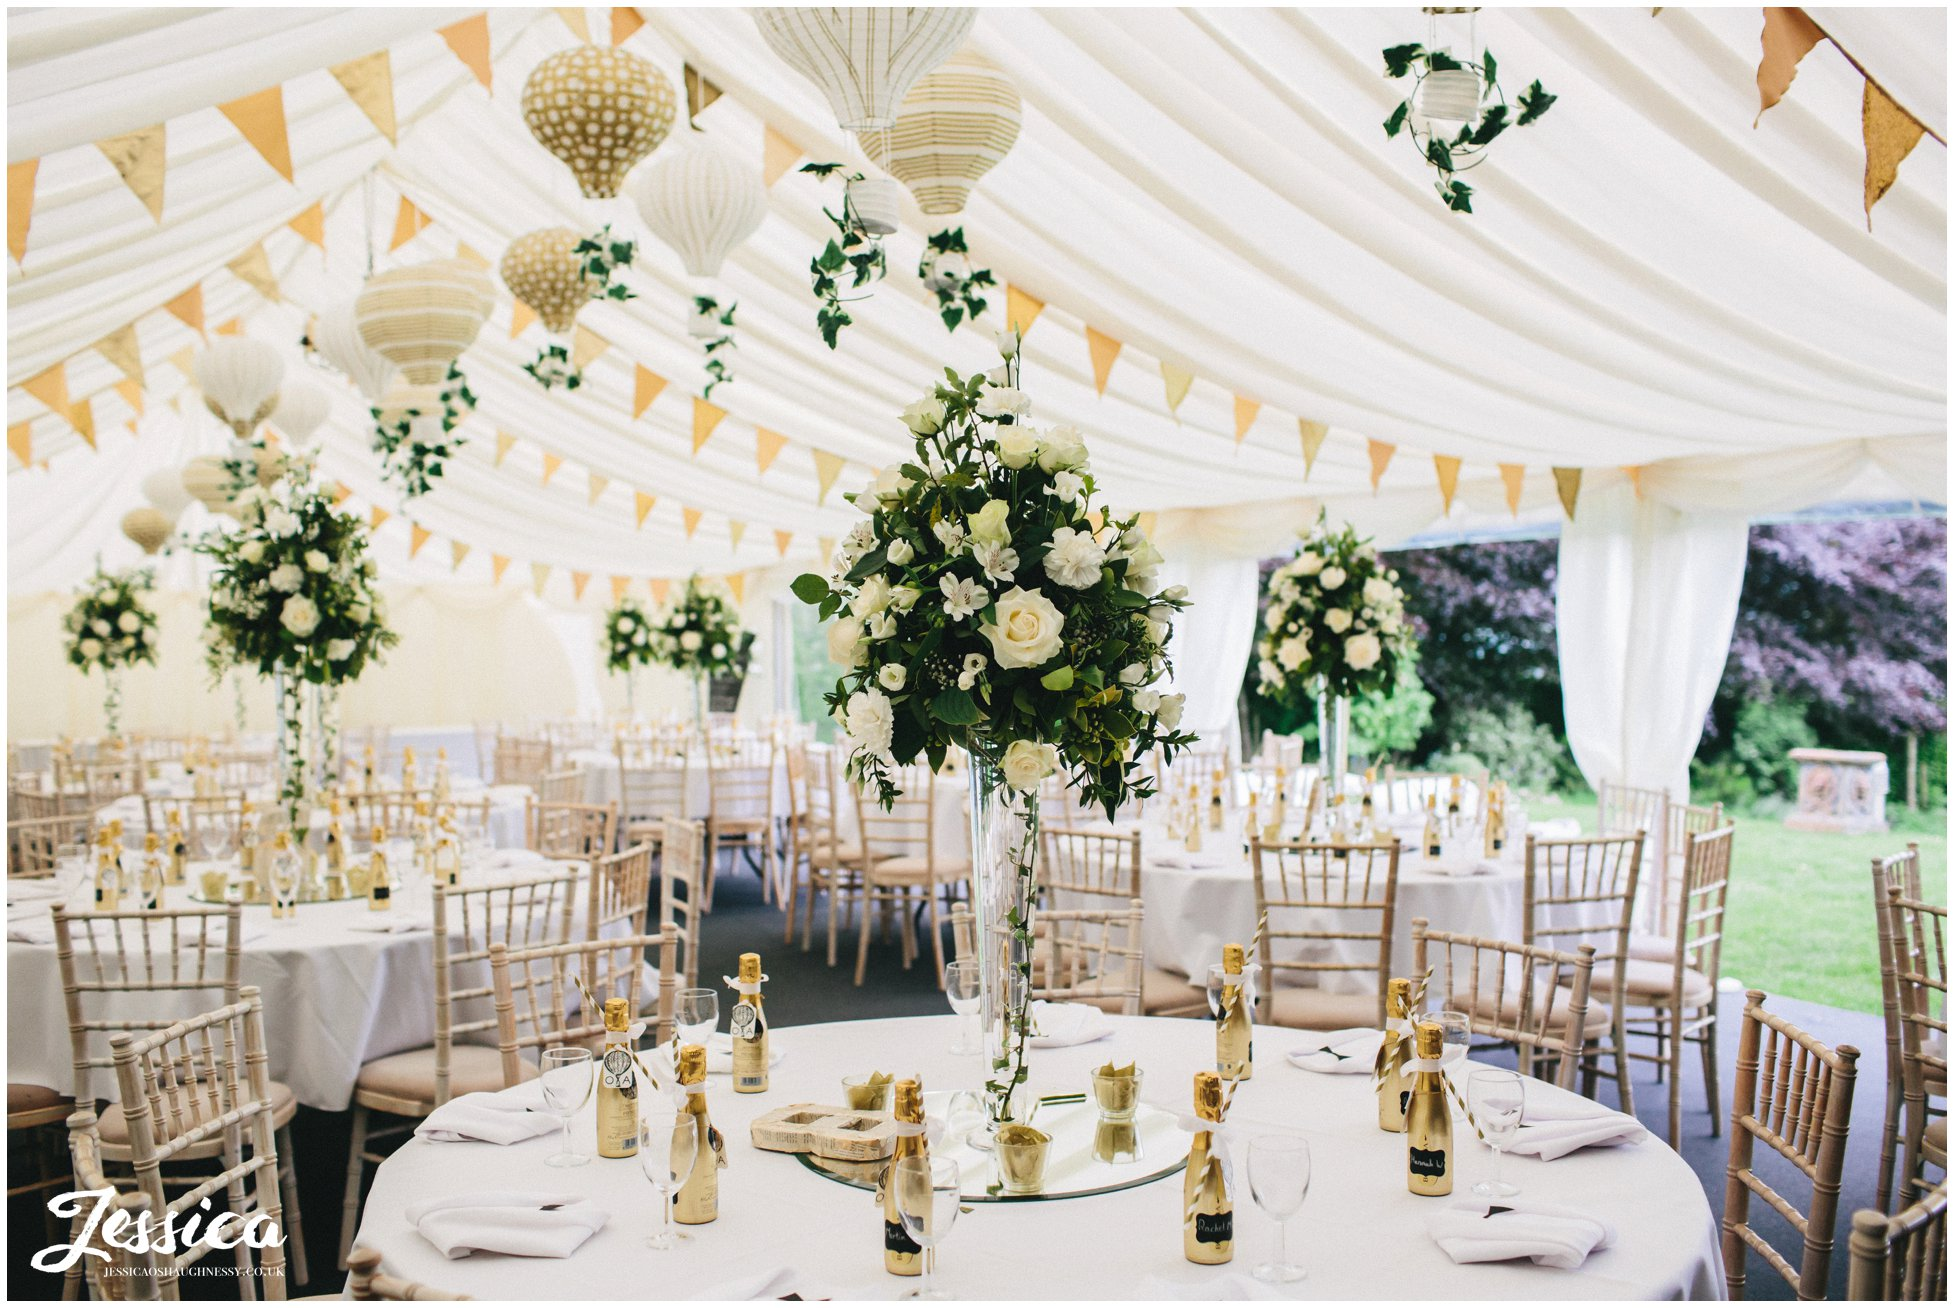 gatsby inspried wedding room at trevor hall